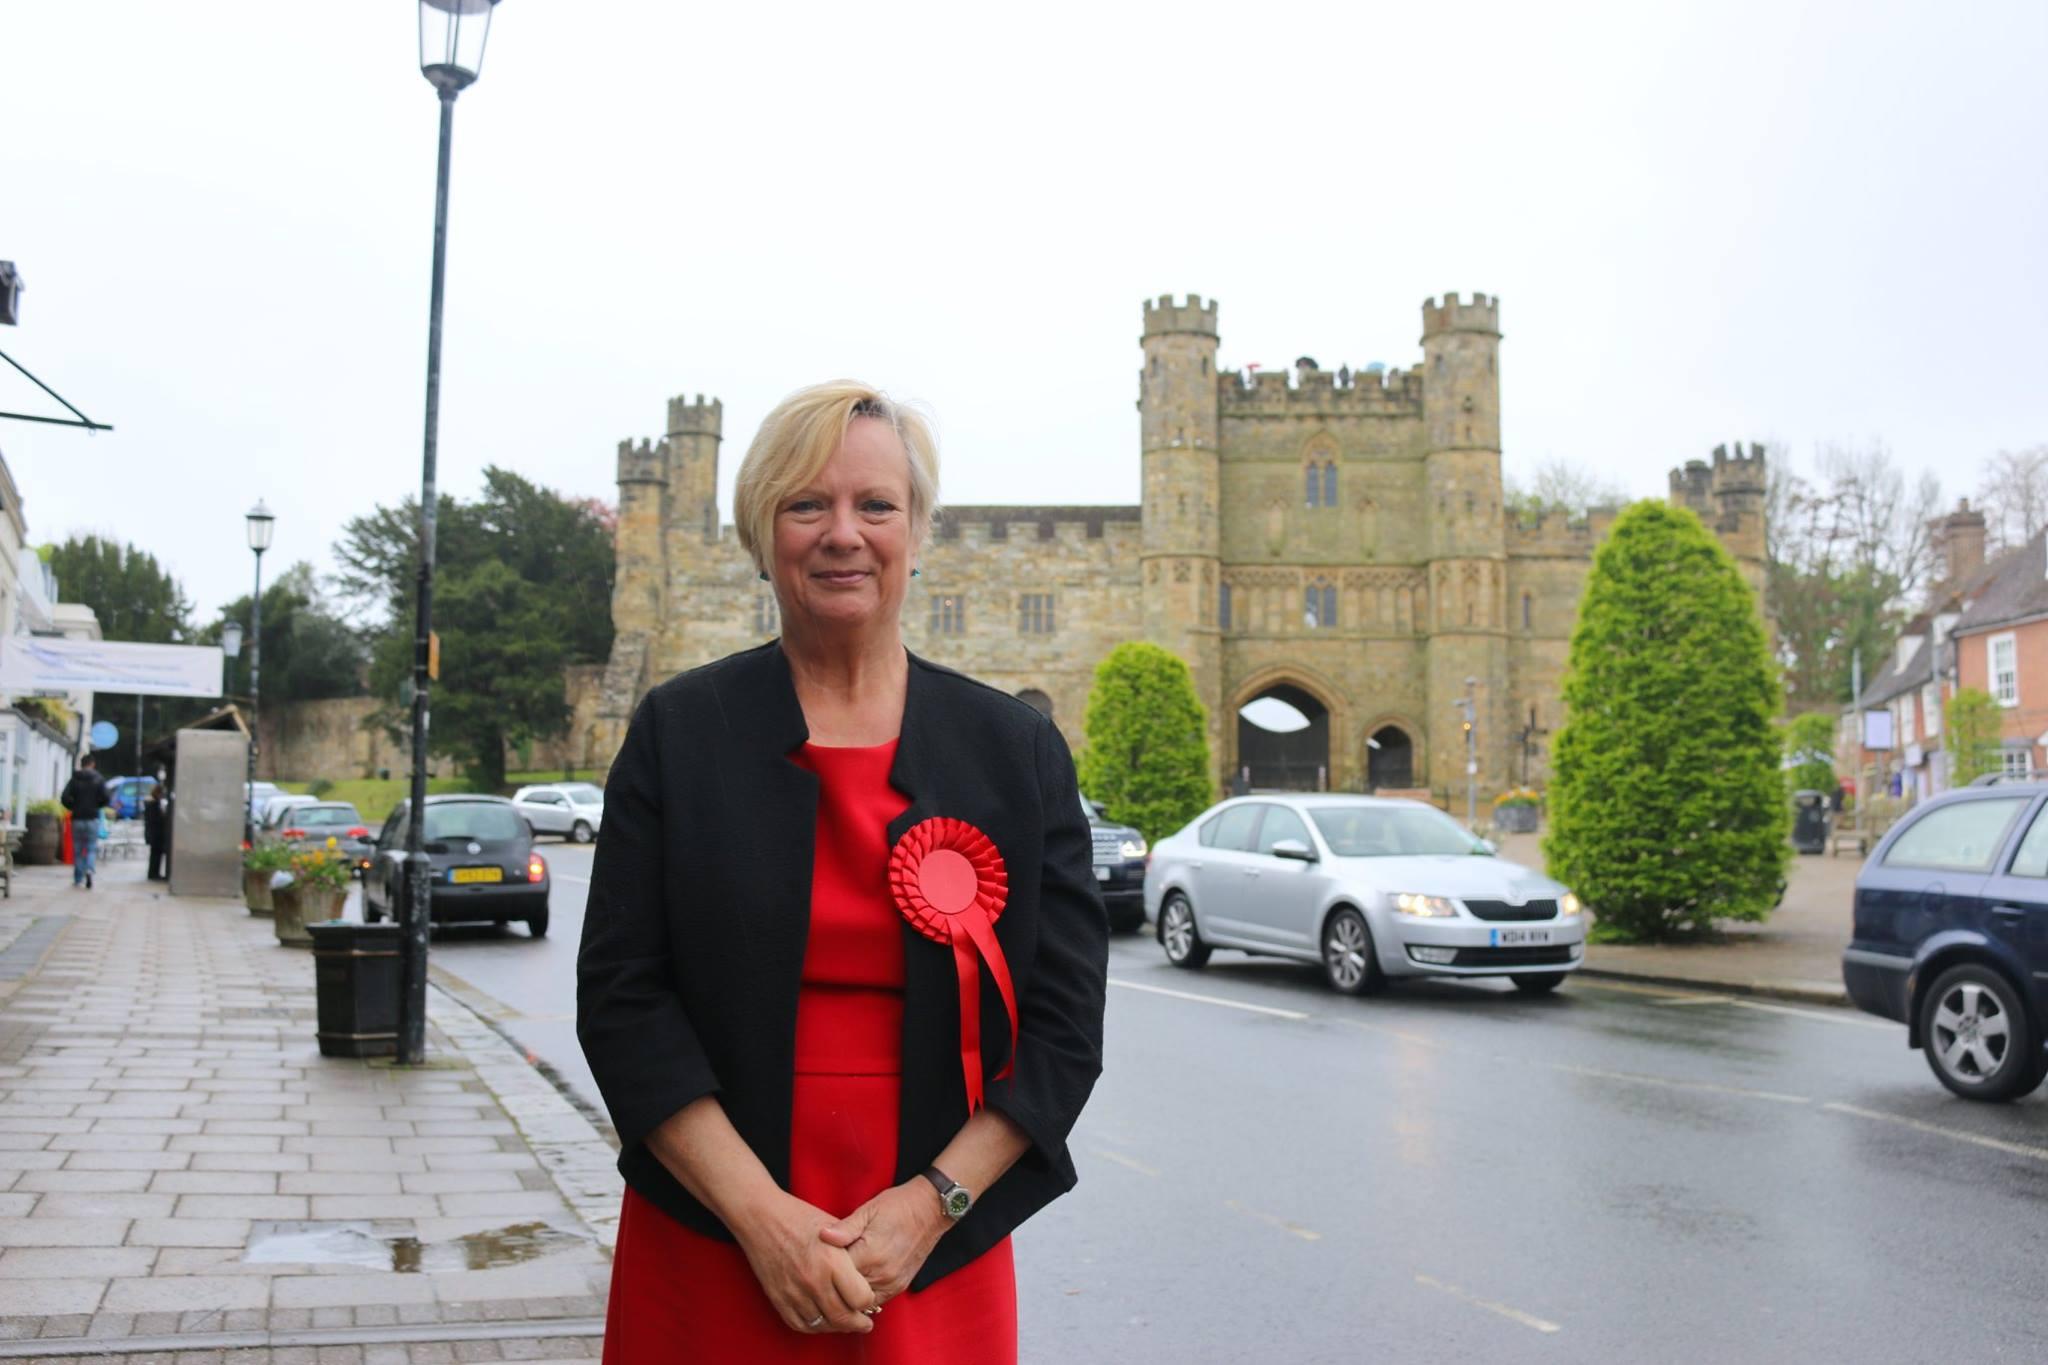 Labour candidate Christine Bayliss